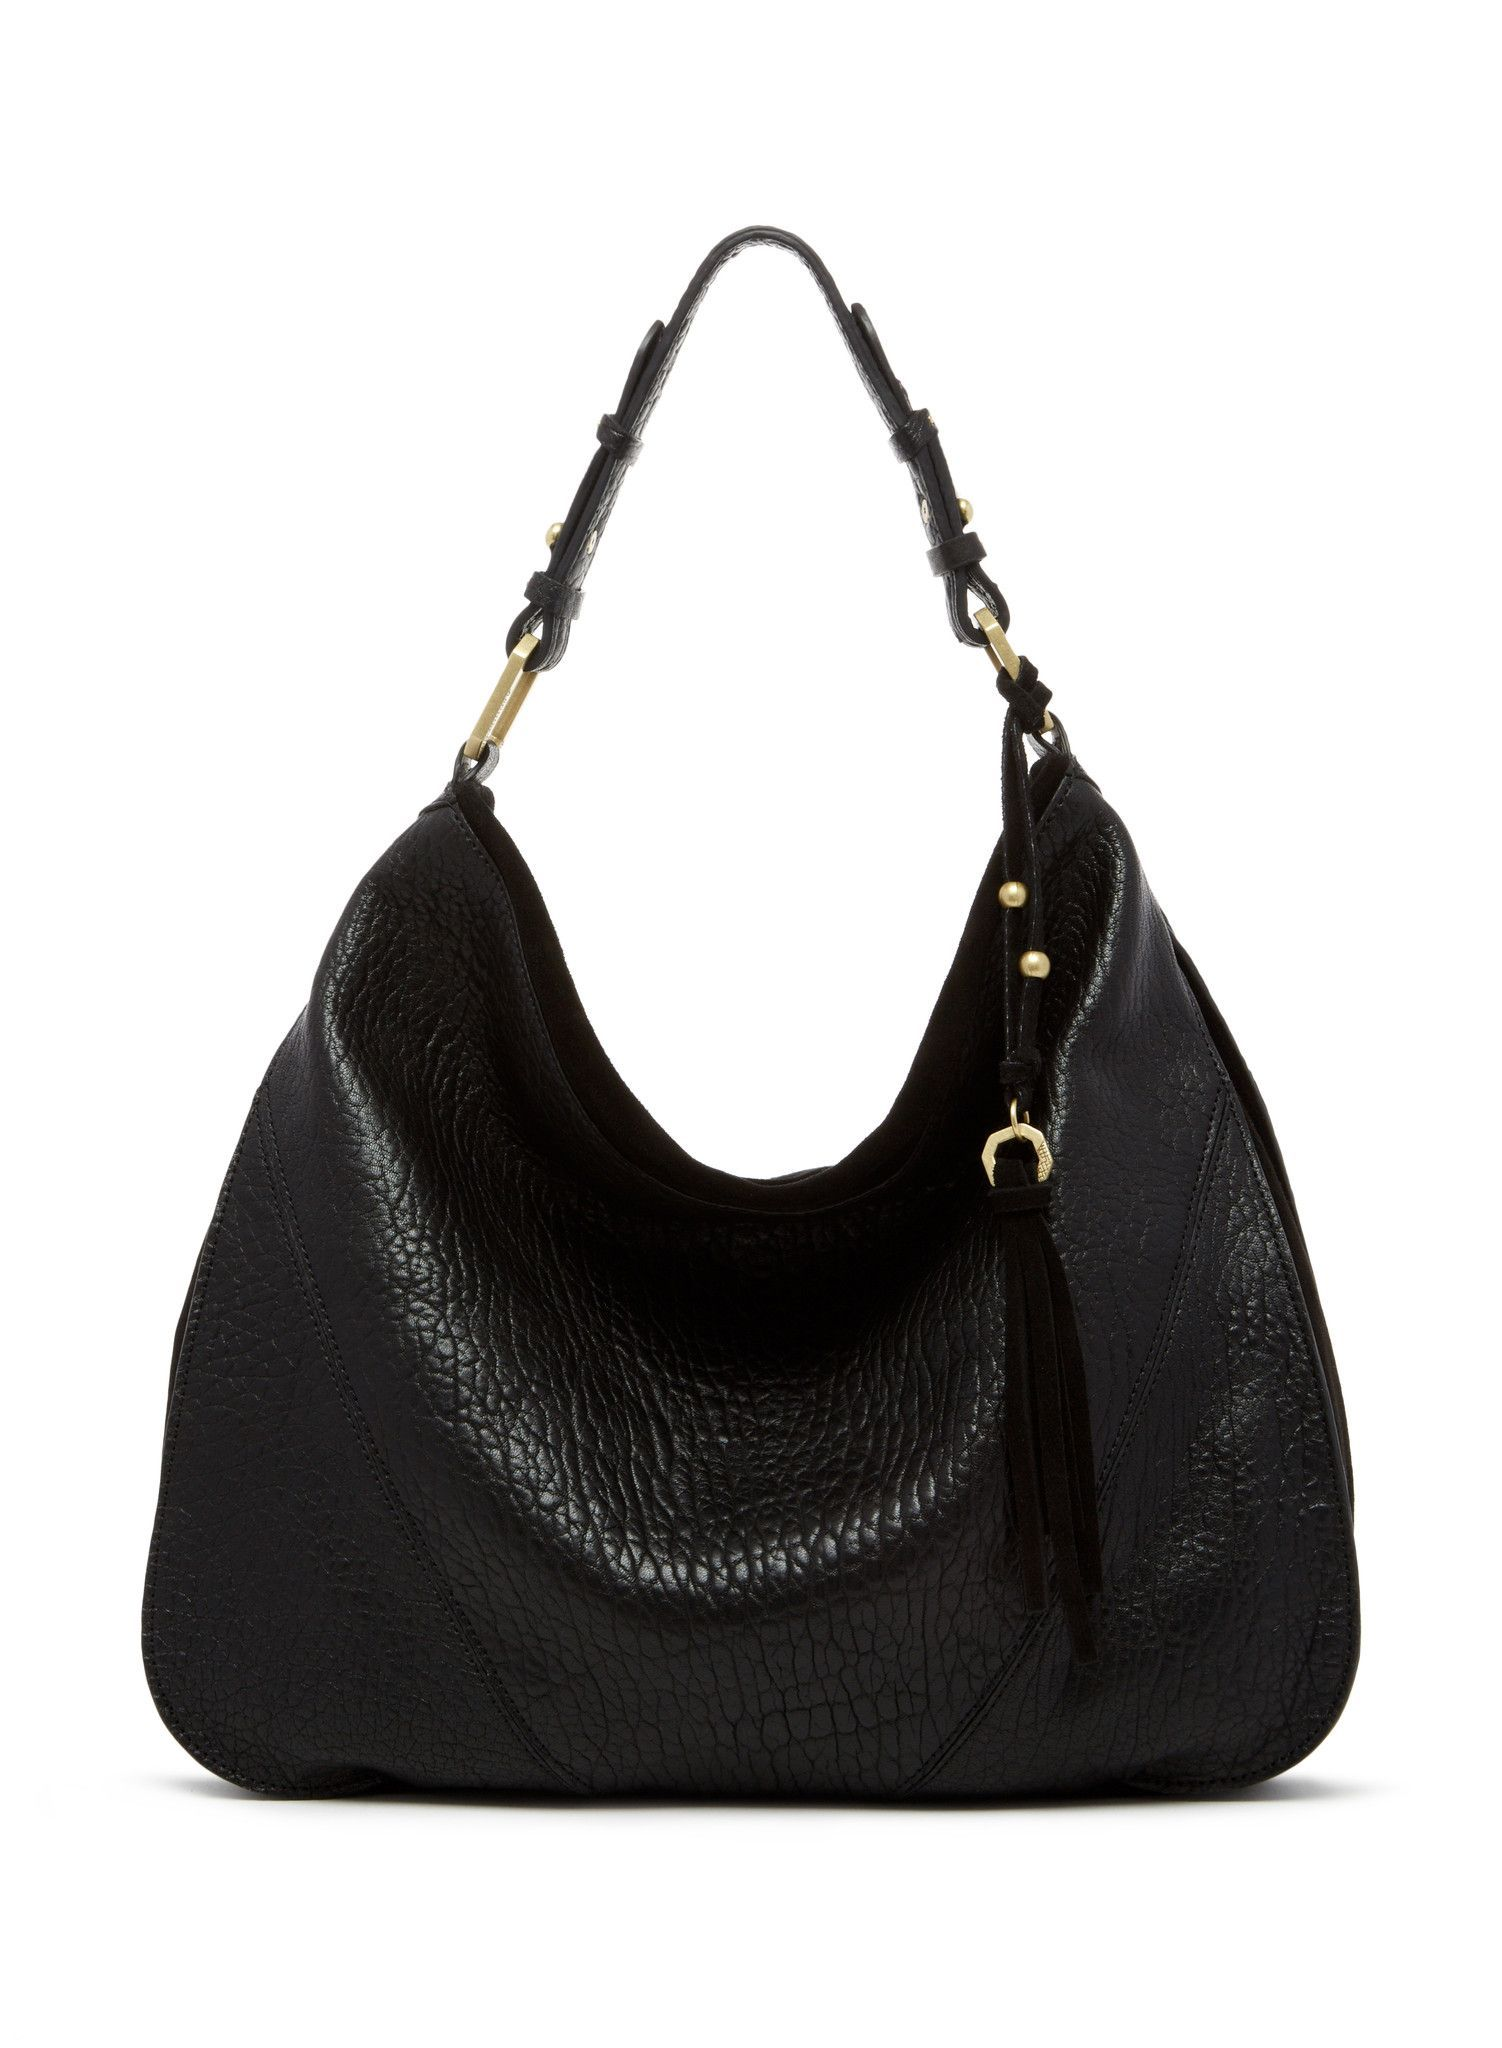 Ella Moss Groupie Black Hobo Ellamoss Handbags Ellamosshandbag Hobos Blackhobos